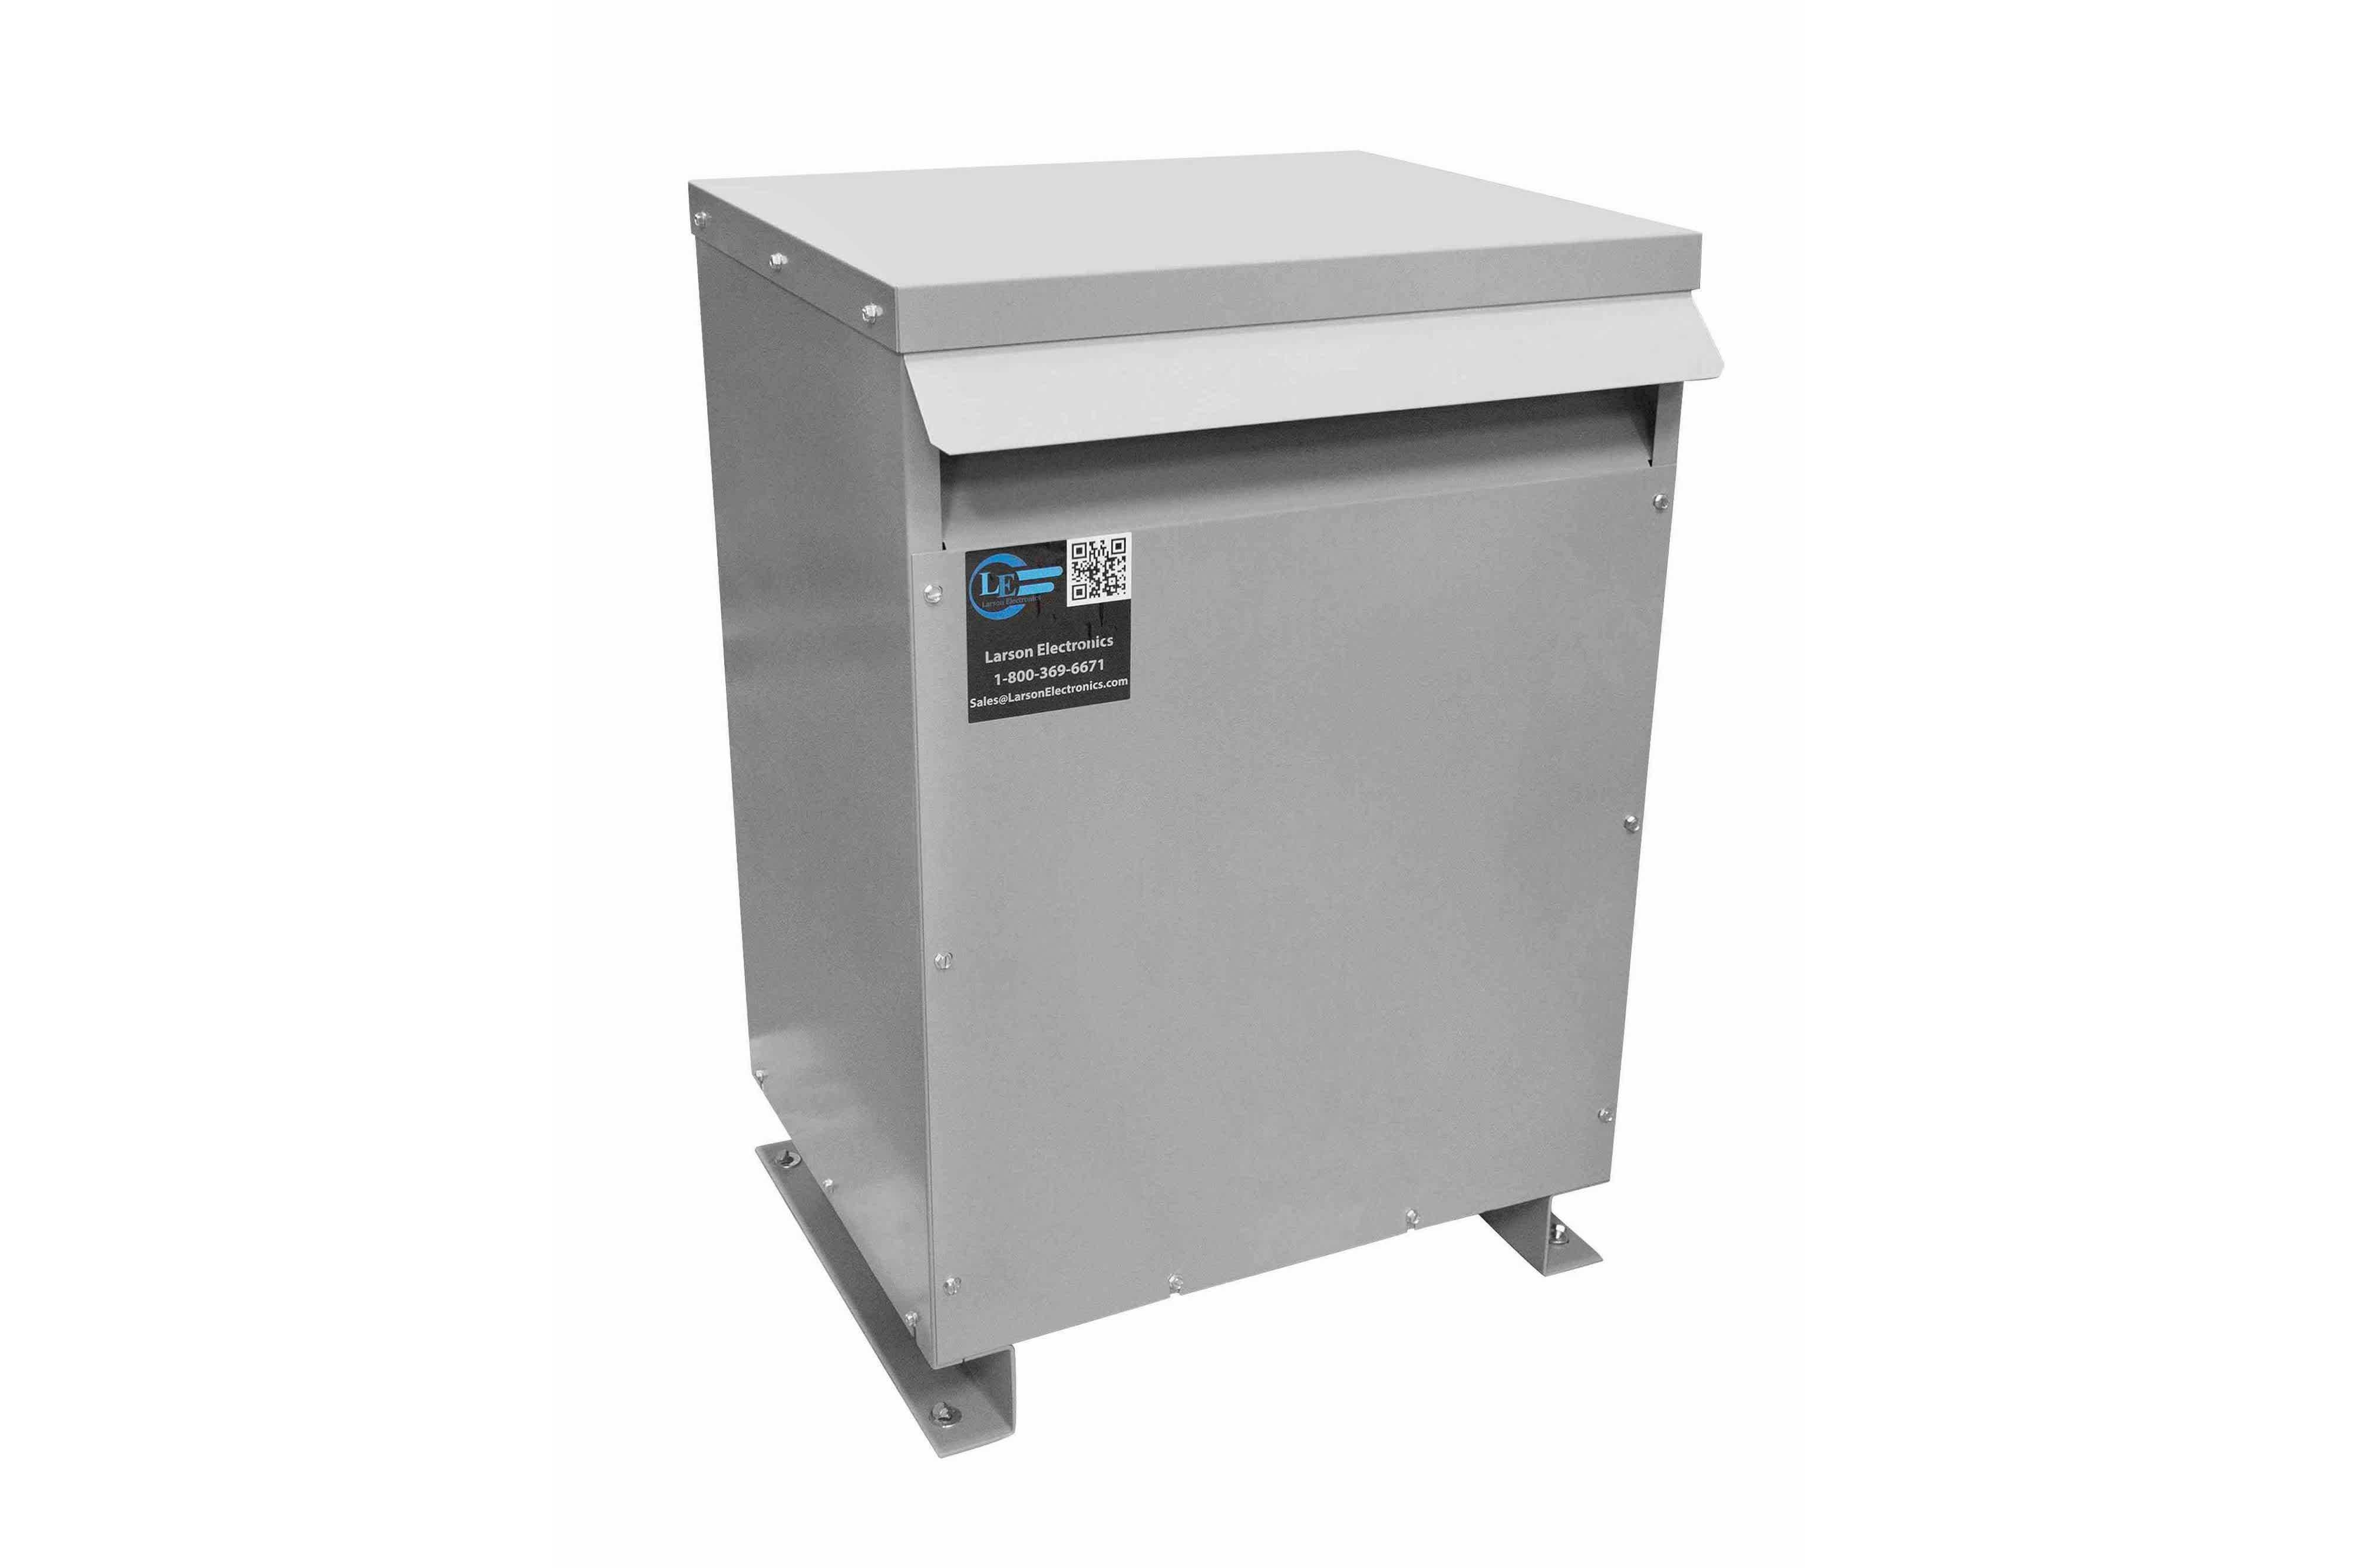 20 kVA 3PH Isolation Transformer, 600V Wye Primary, 400Y/231 Wye-N Secondary, N3R, Ventilated, 60 Hz